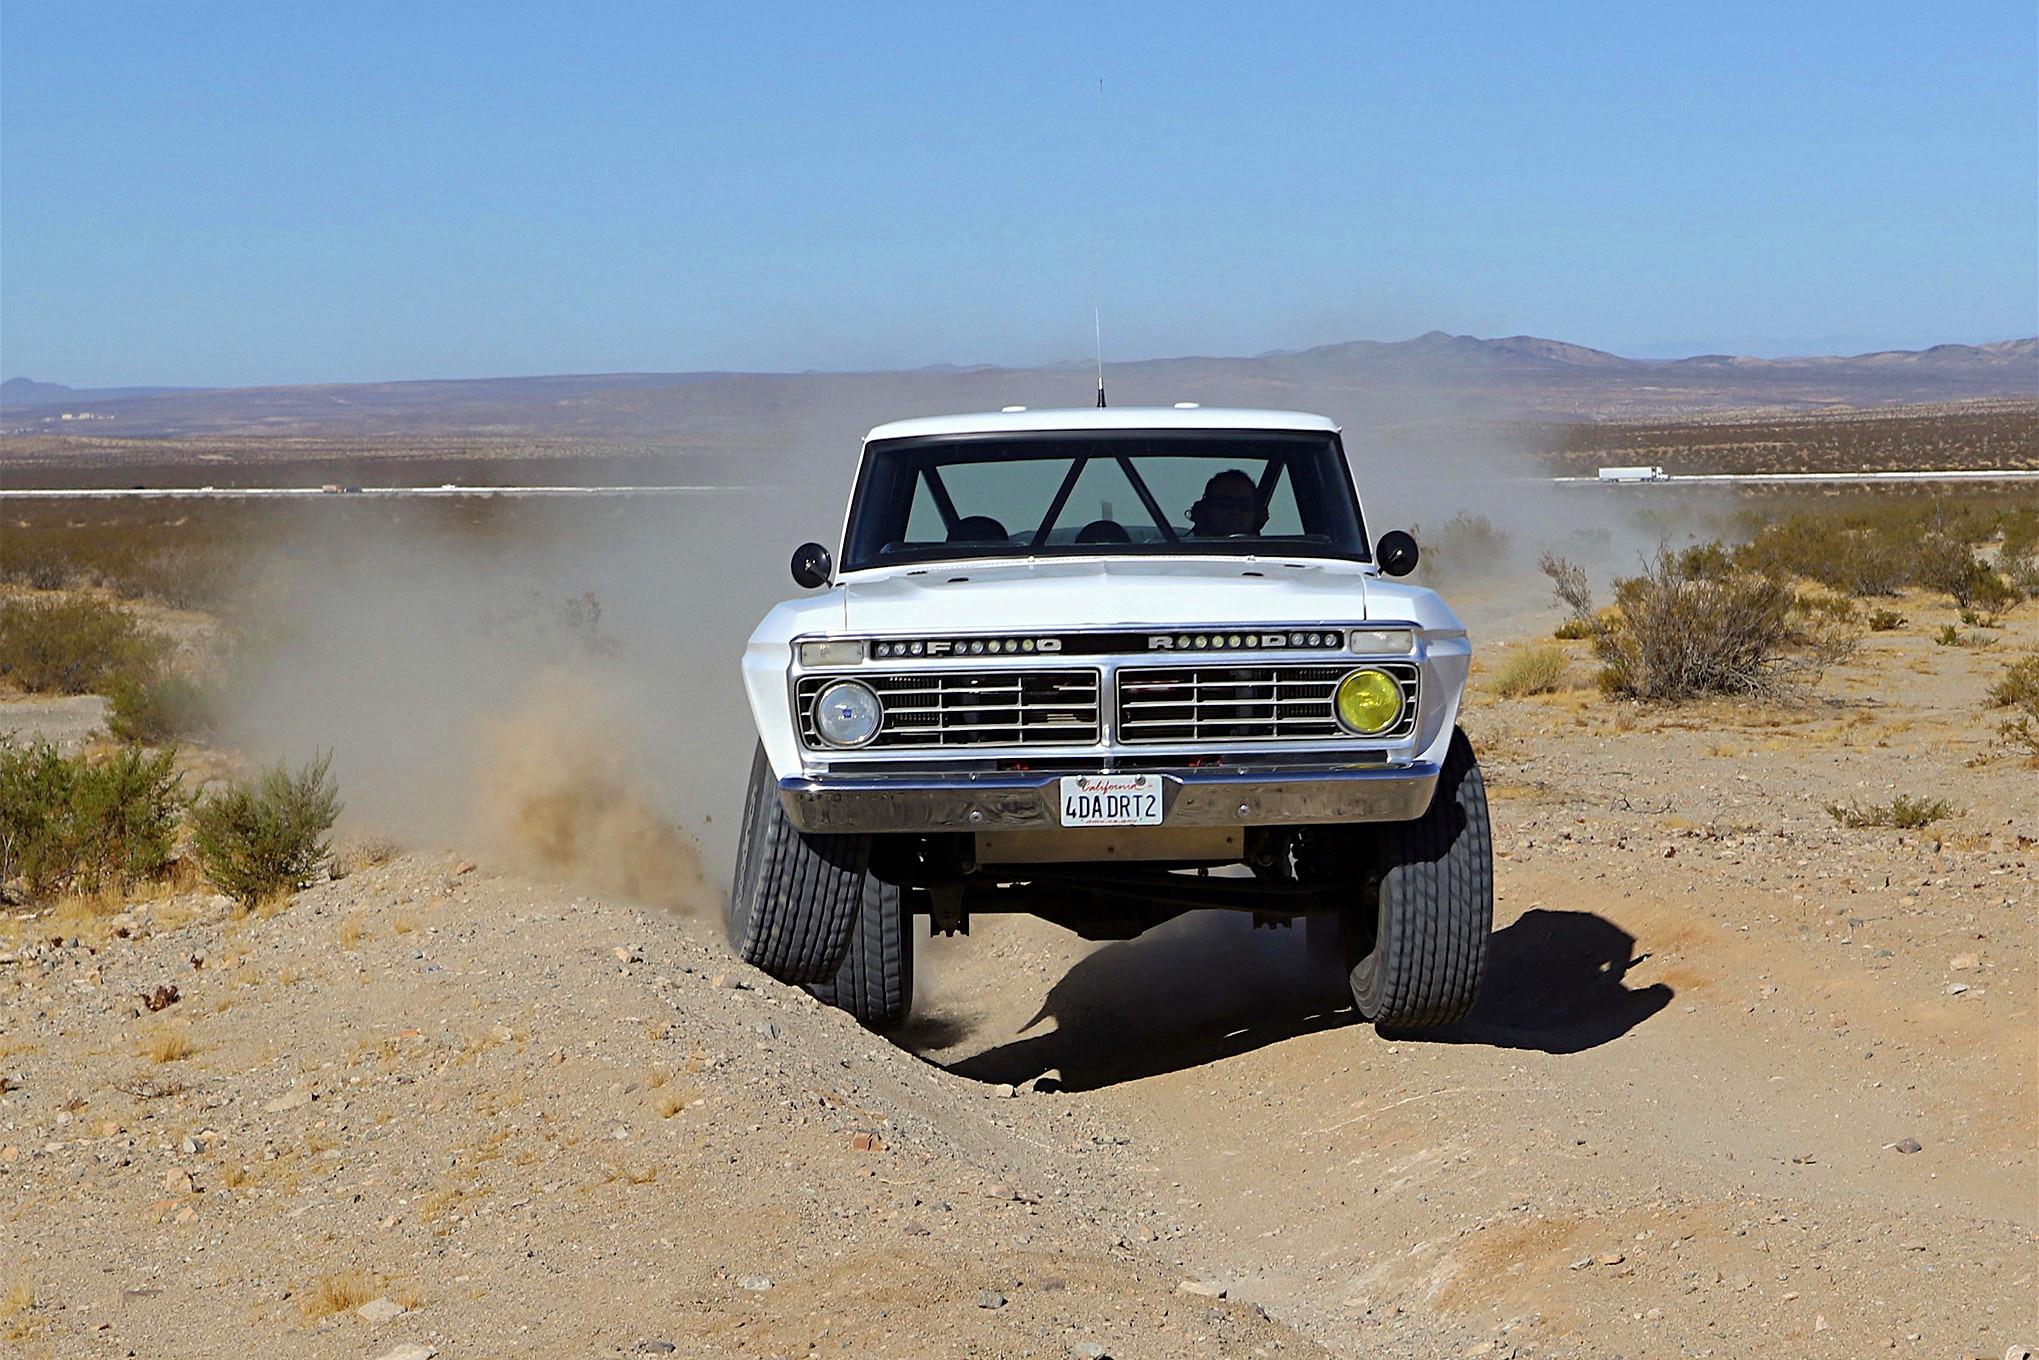 023 ford f100 bfgoodrich blitzkrieg fox eibach kmc dirt tech desertworks mcqueen trailer products driving head on.JPG